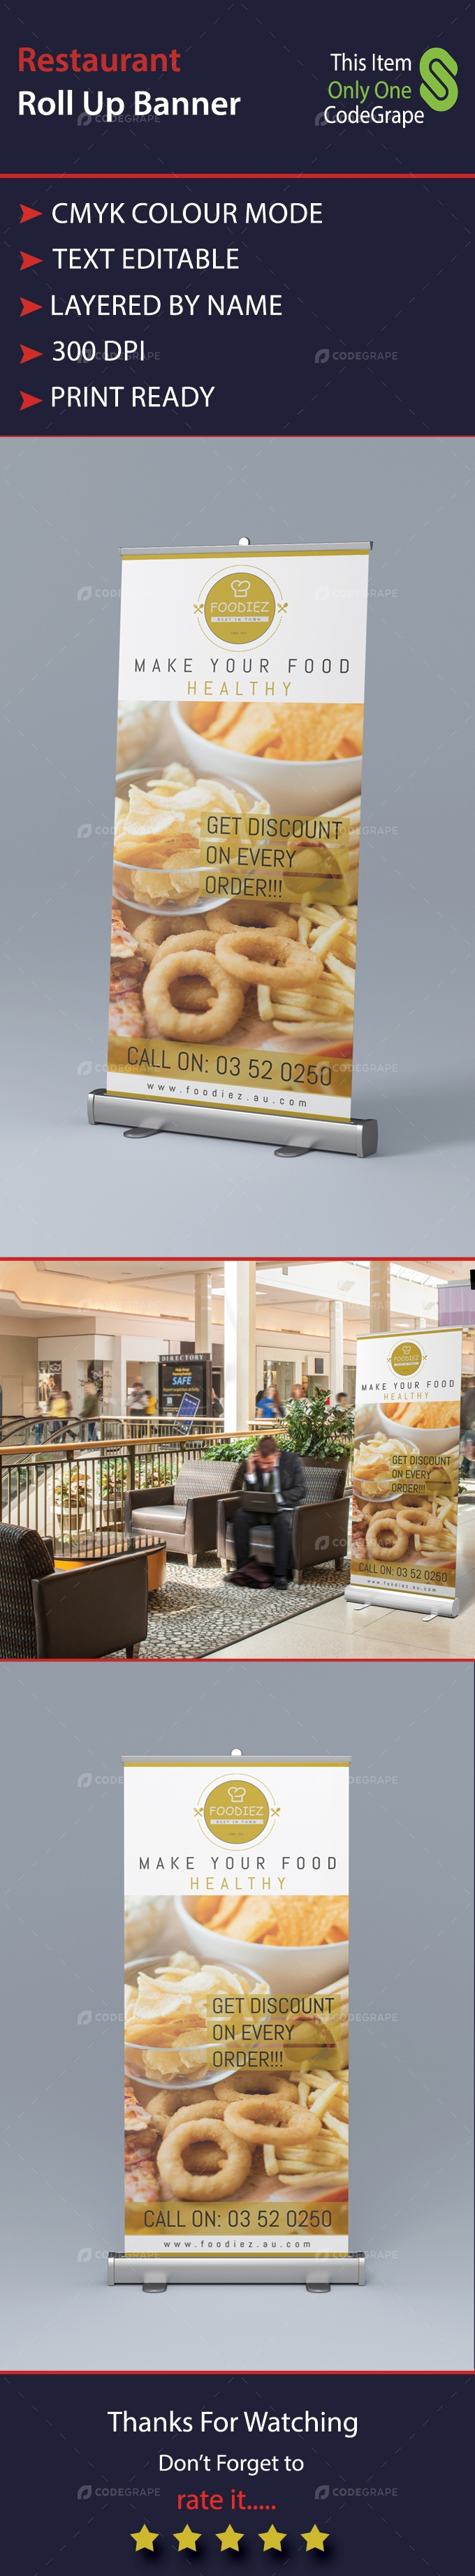 Restaurant Roll-up Banner